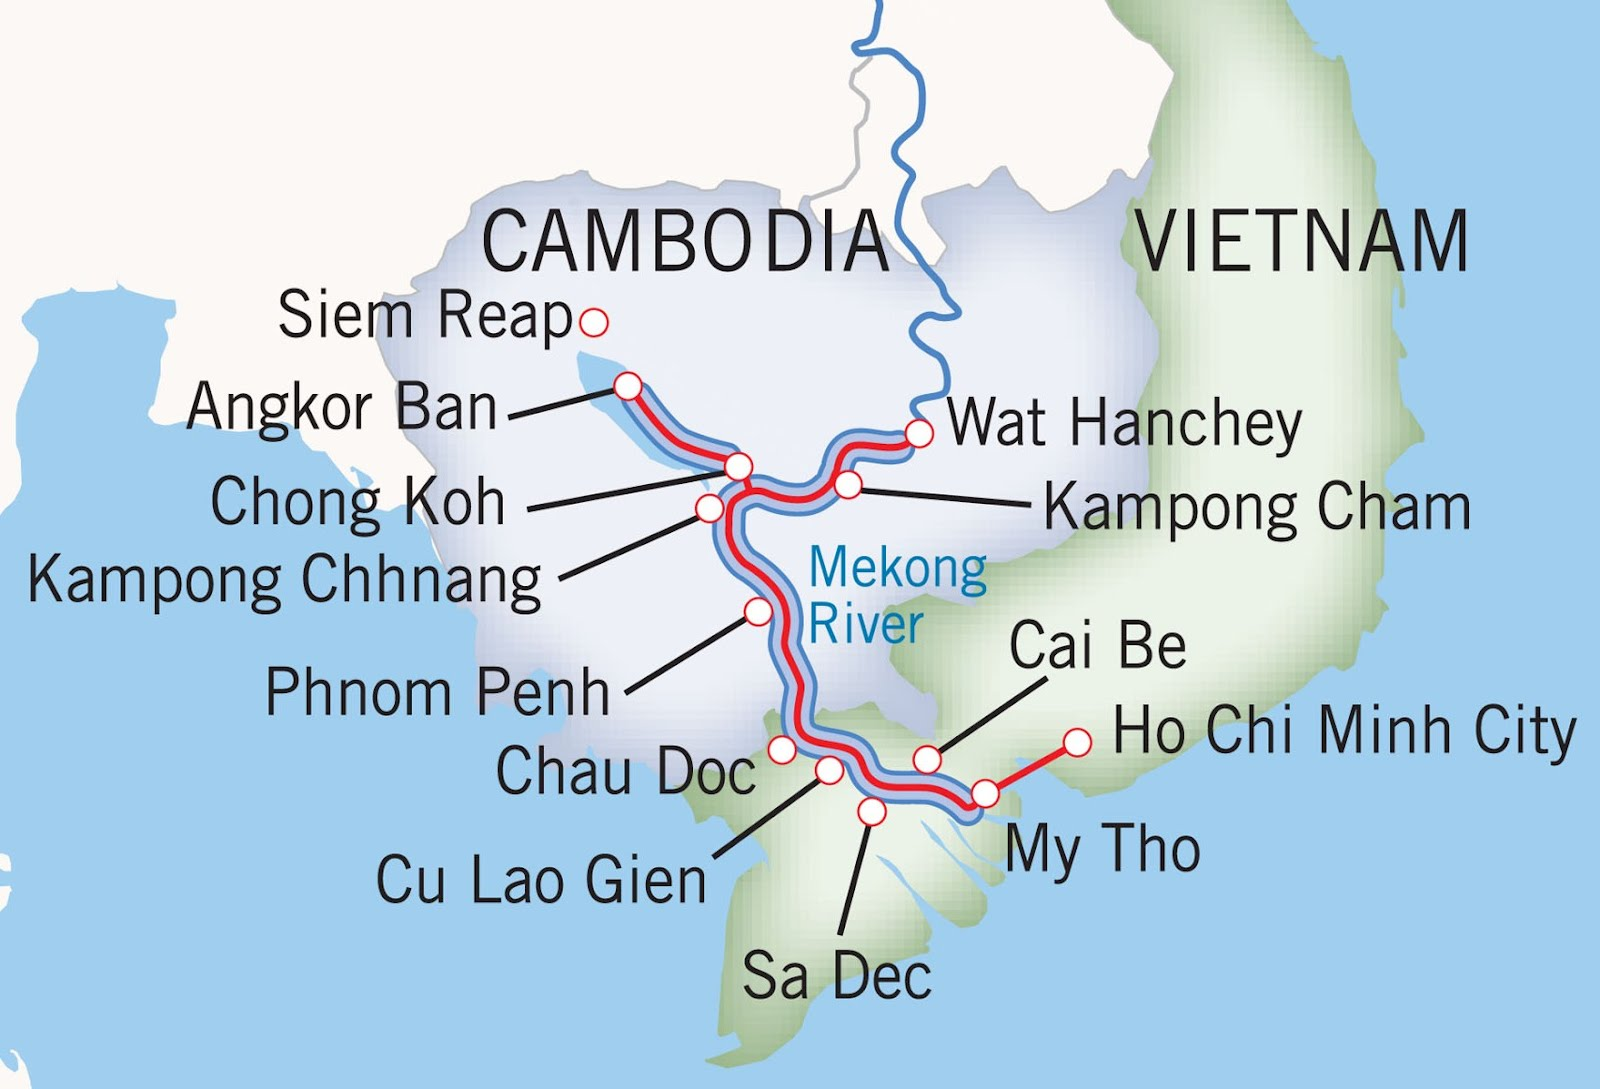 sa dec vietnam map The Mekong Delta Vietnam